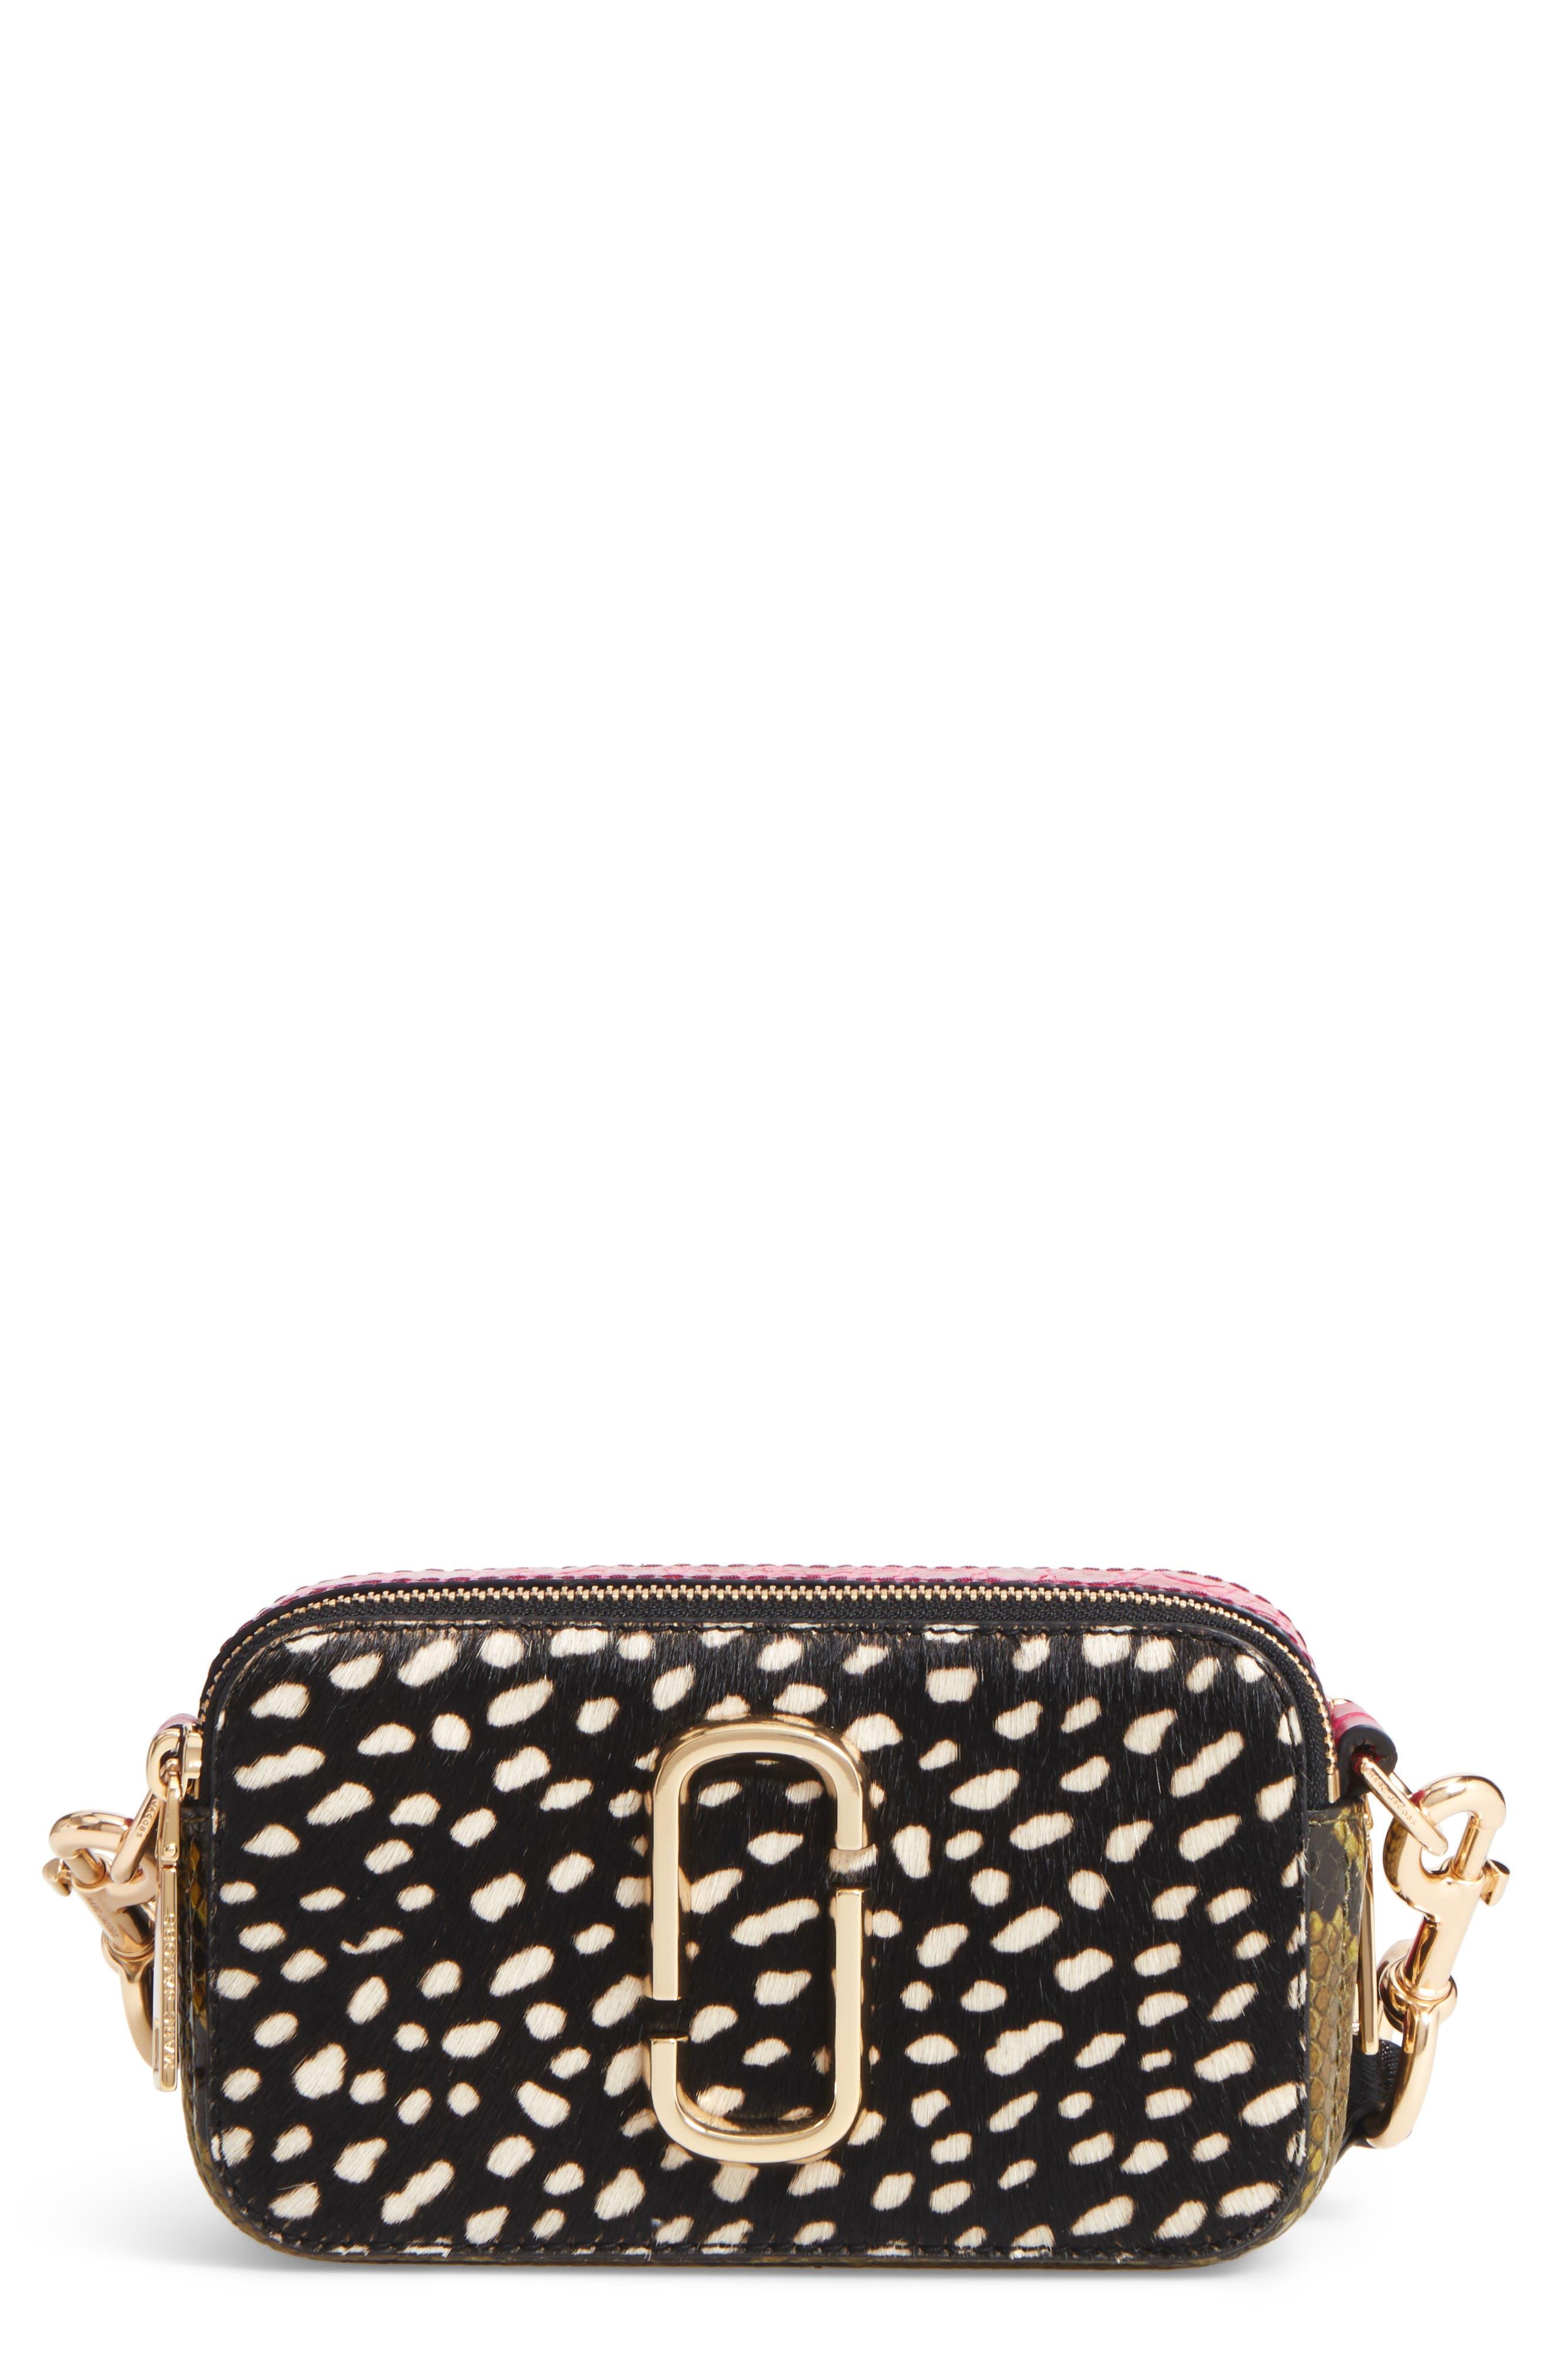 Snapshot Crossbody Bag,                             Main thumbnail 1, color,                             Black Multi